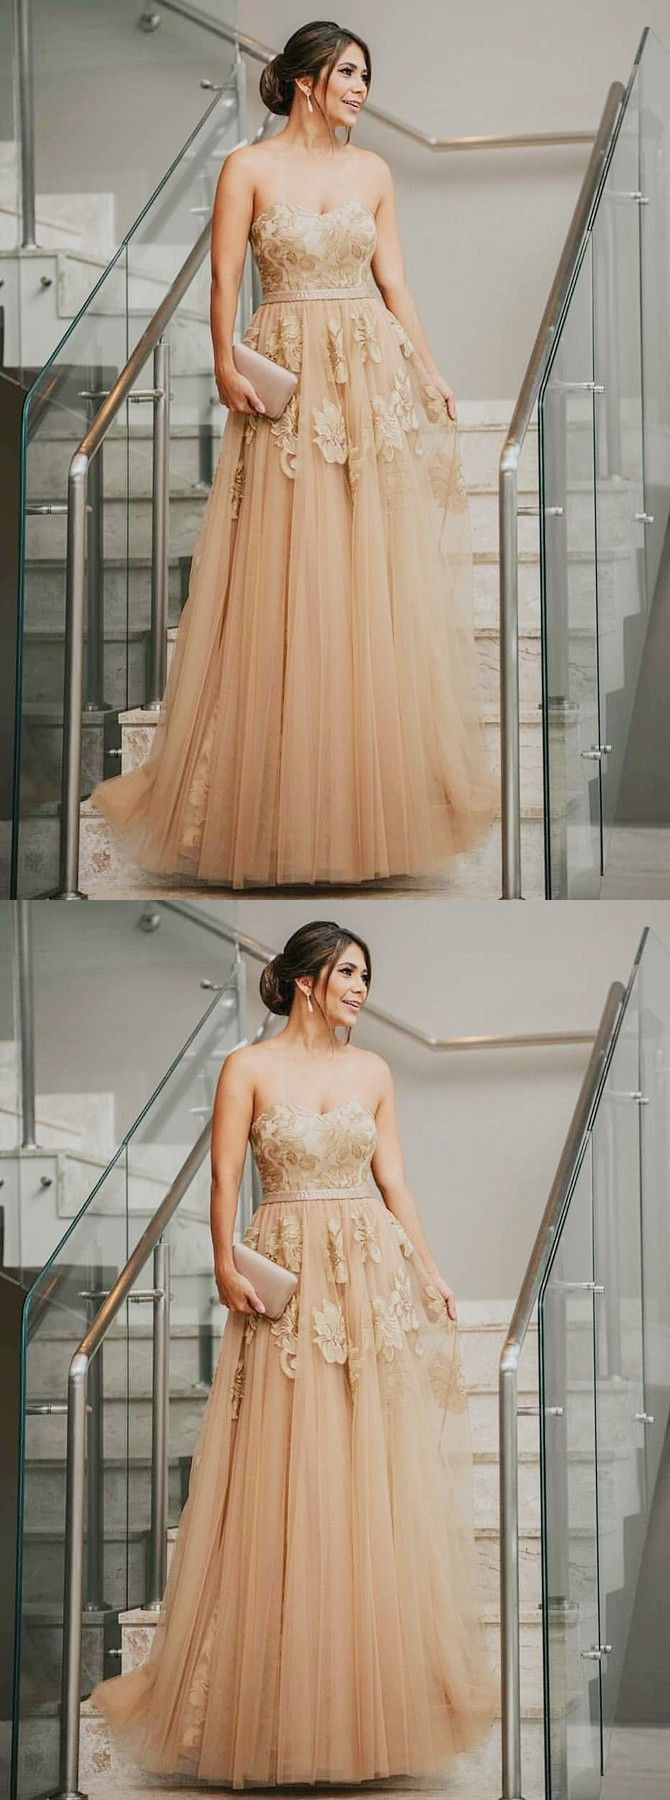 Elegant aline sweetheart open back champagne tulle long prom